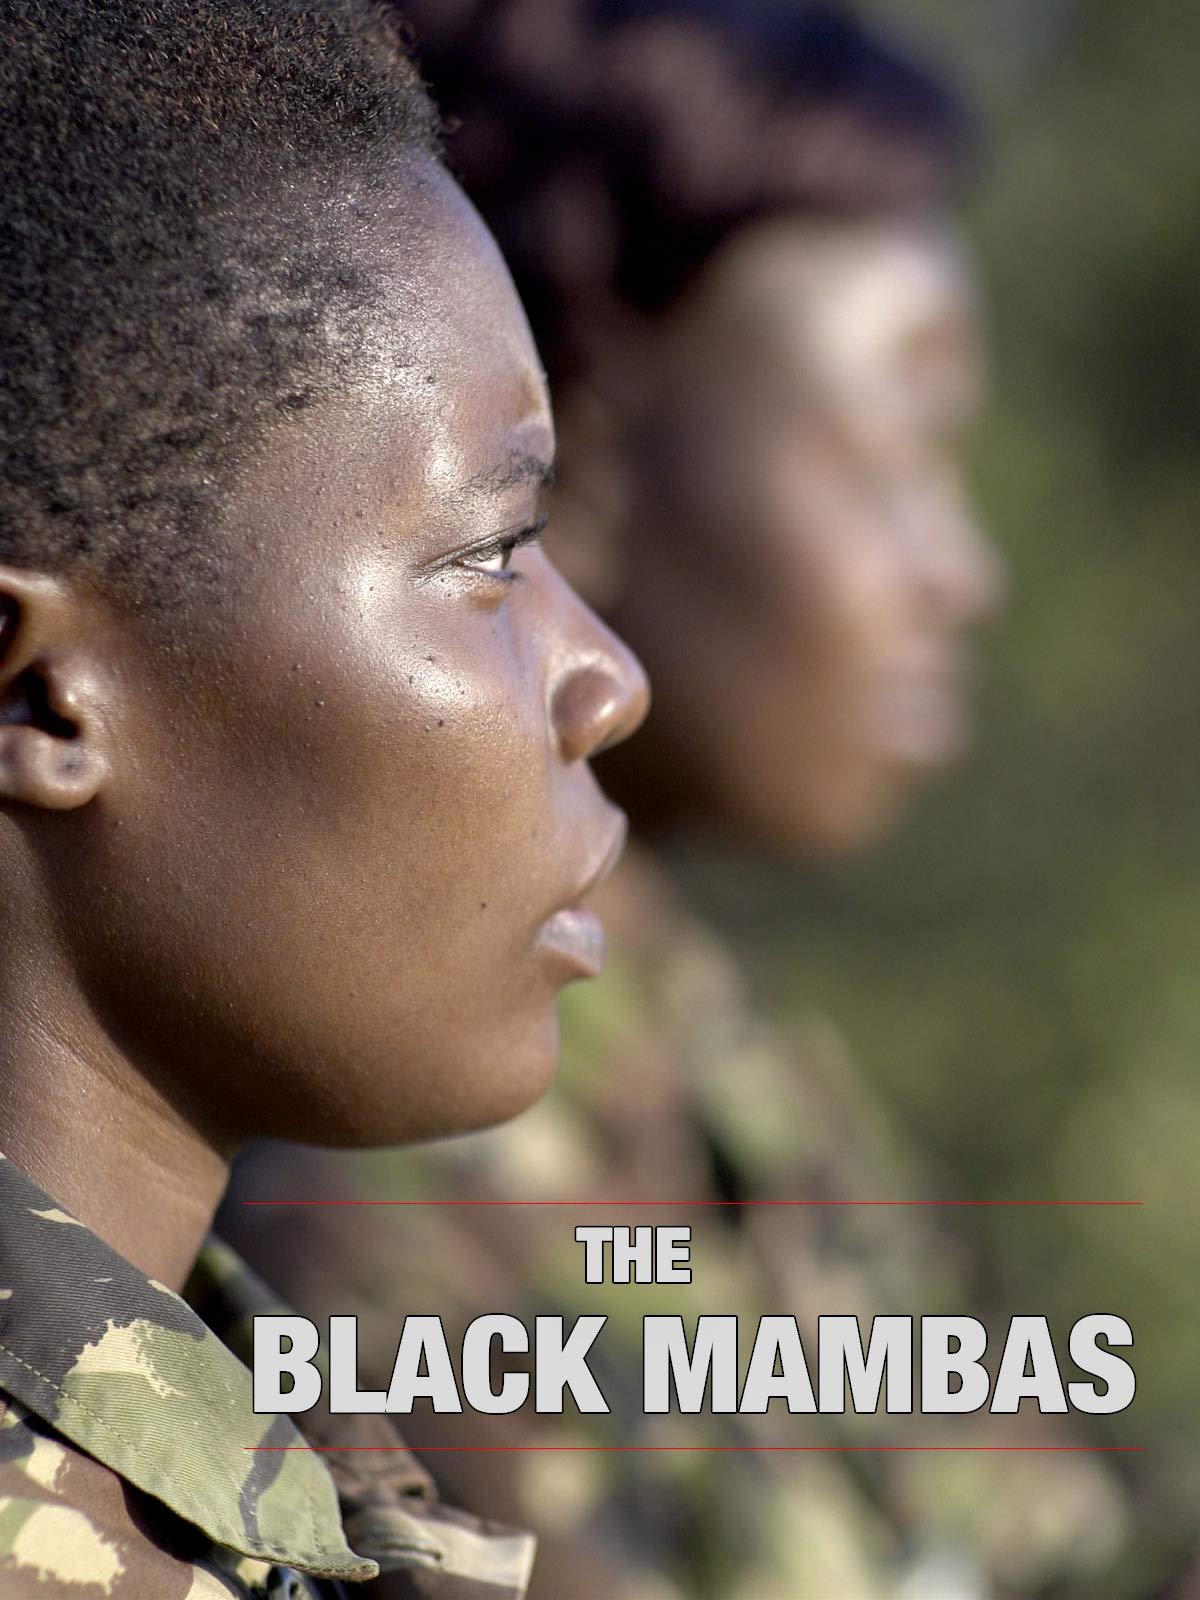 The Black Mambas